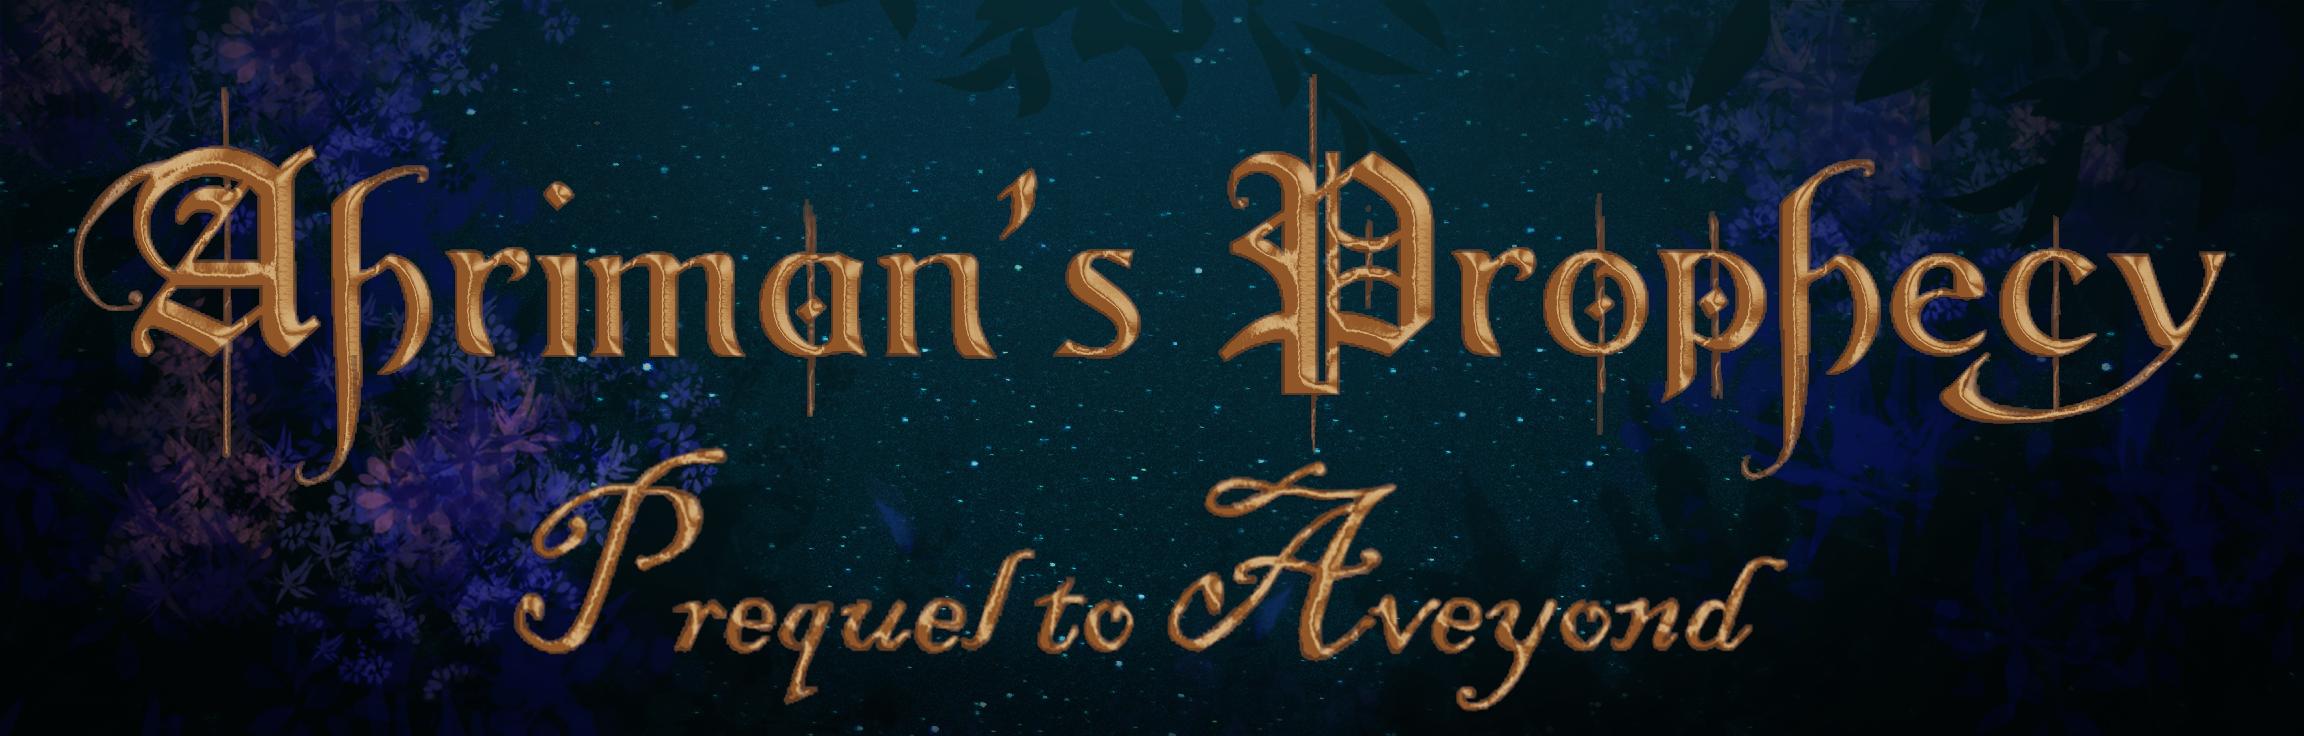 Ahriman's Prophecy - Demo